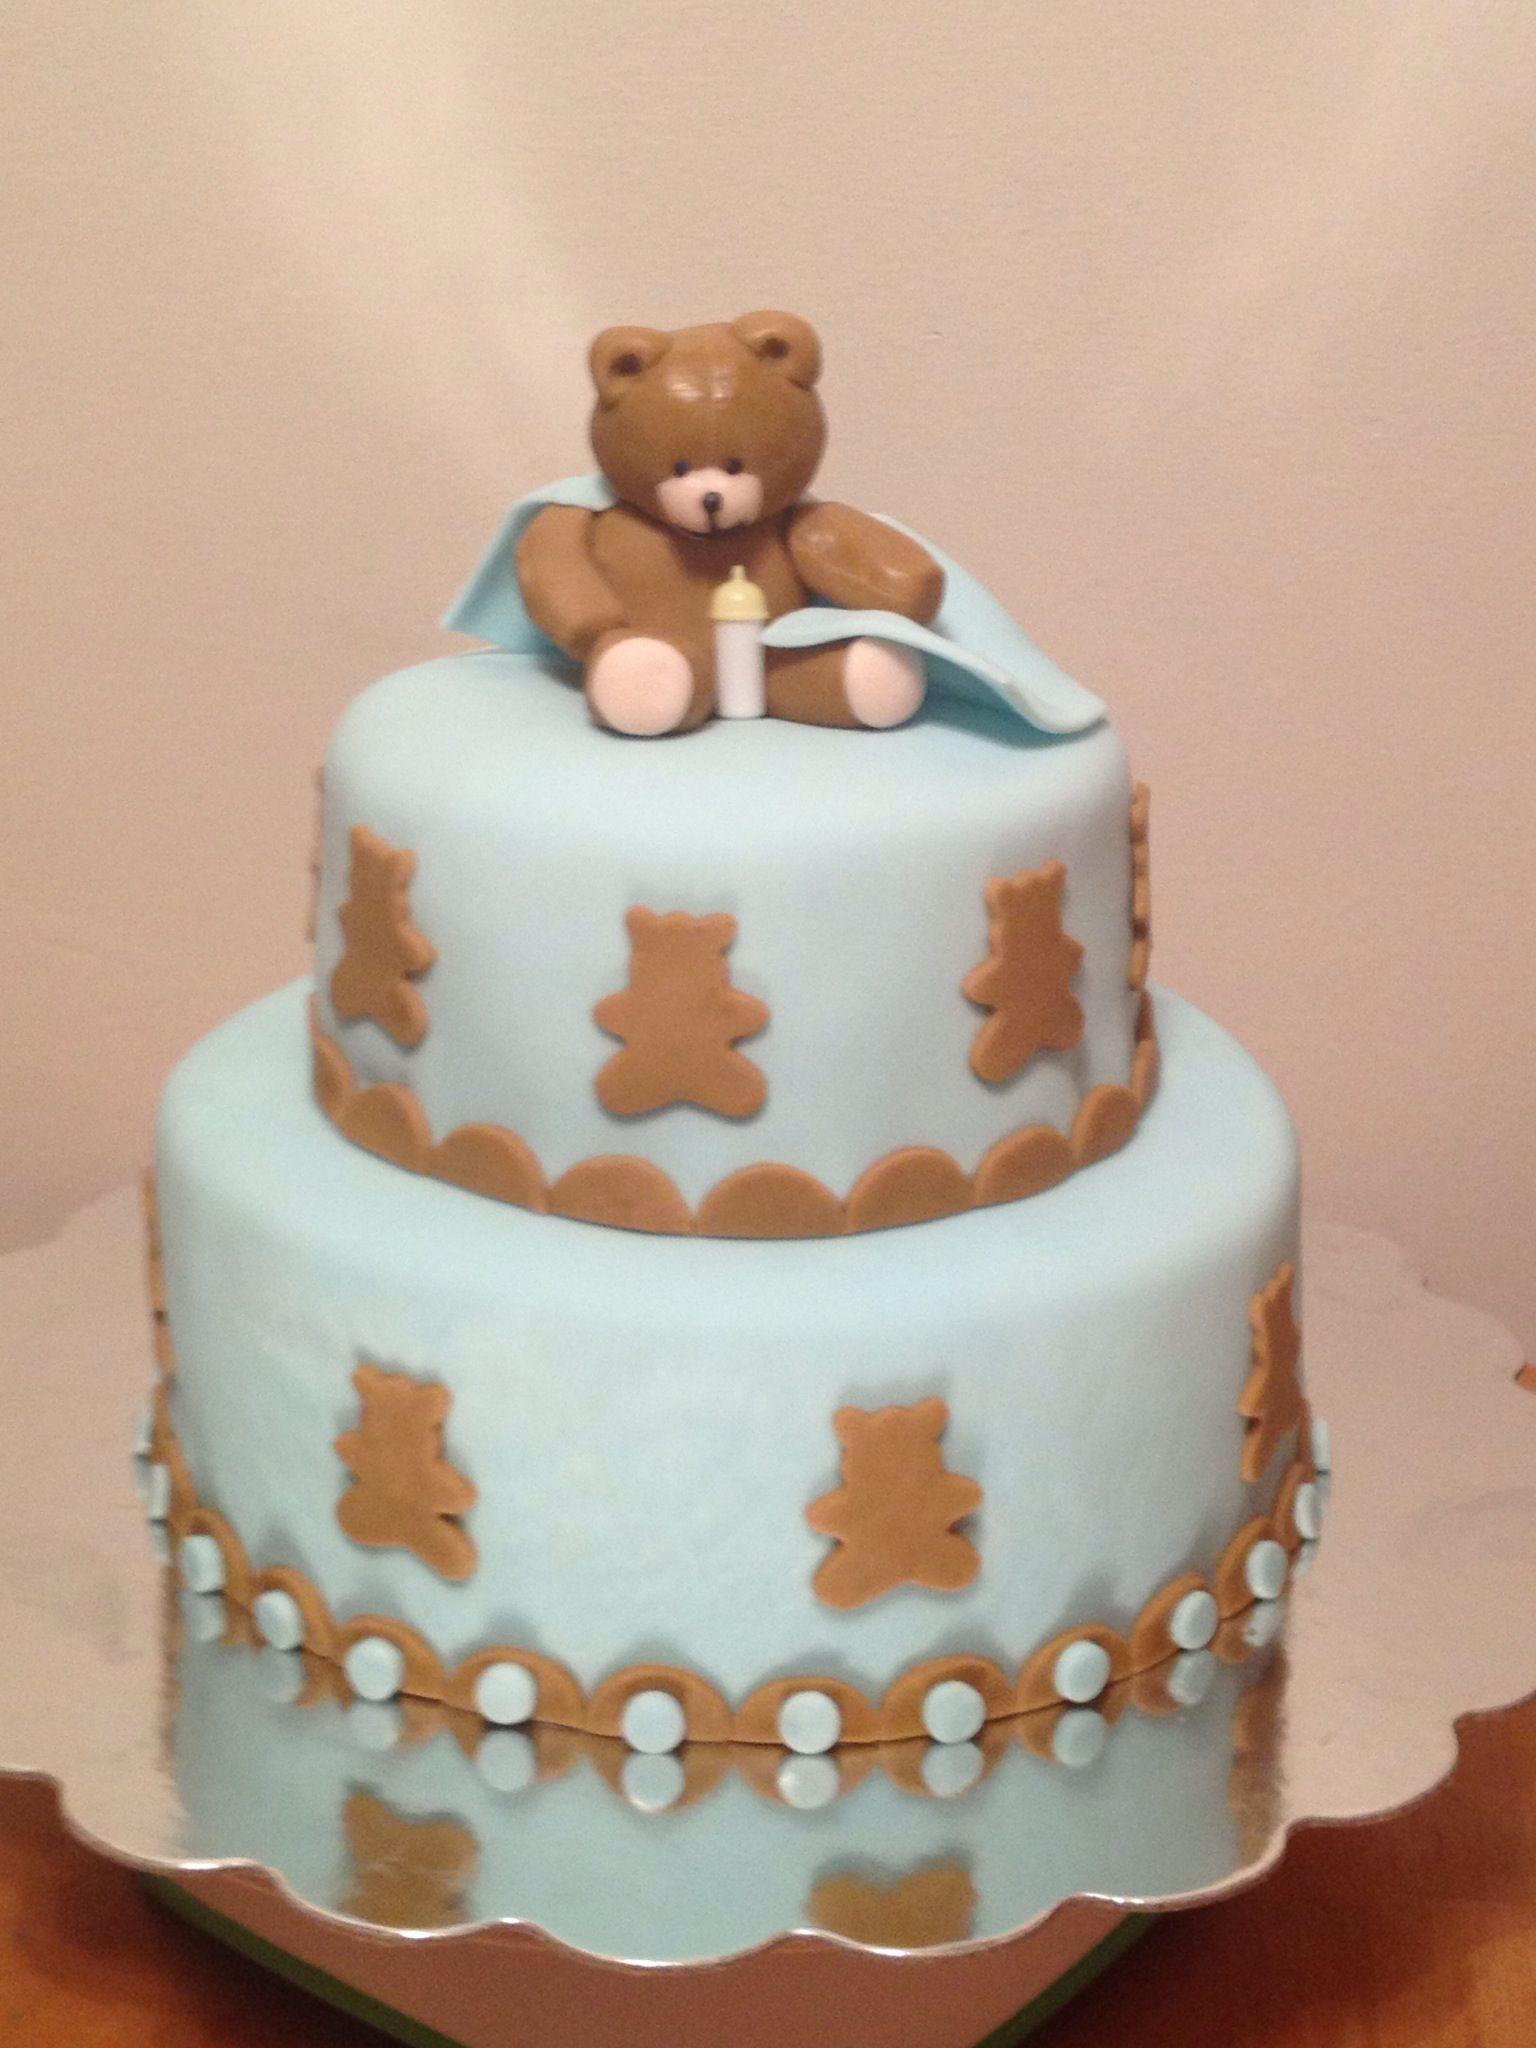 baby shower cake blue teddy bear theme skeeter jeffrey dean pi